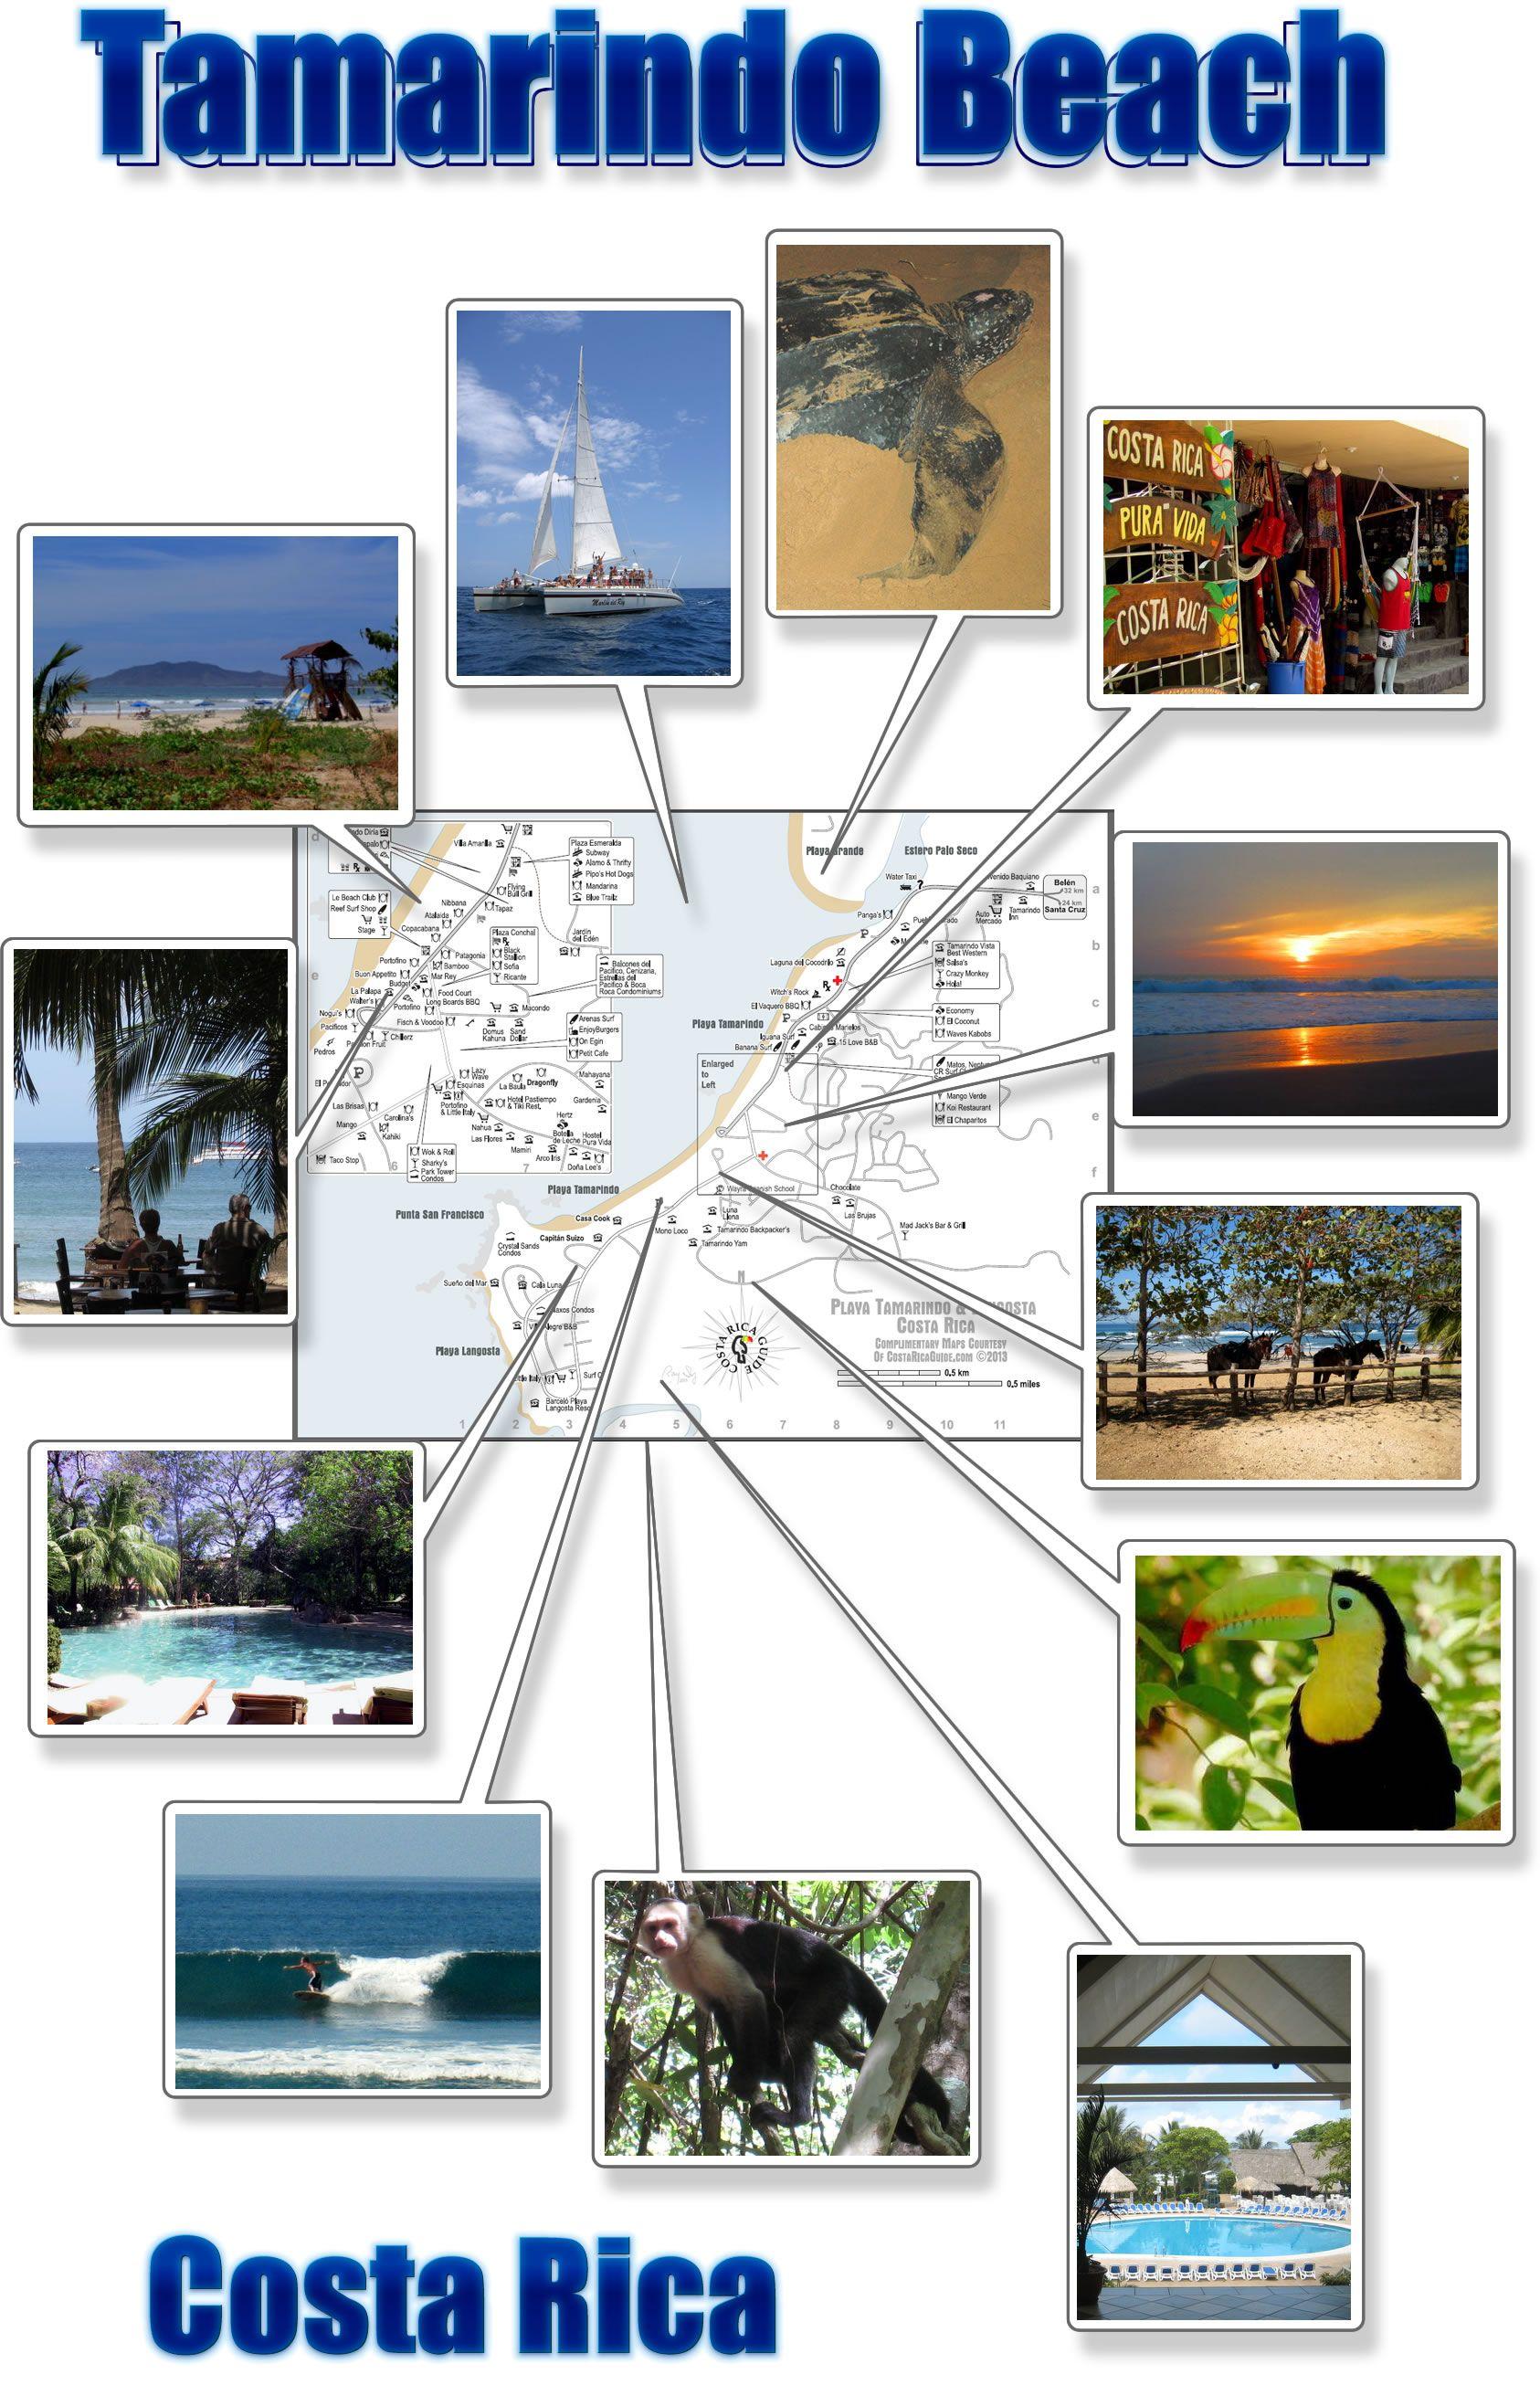 map tamarindo beach costa rica Tamarindo Beach Map Free Printable Download Including map tamarindo beach costa rica